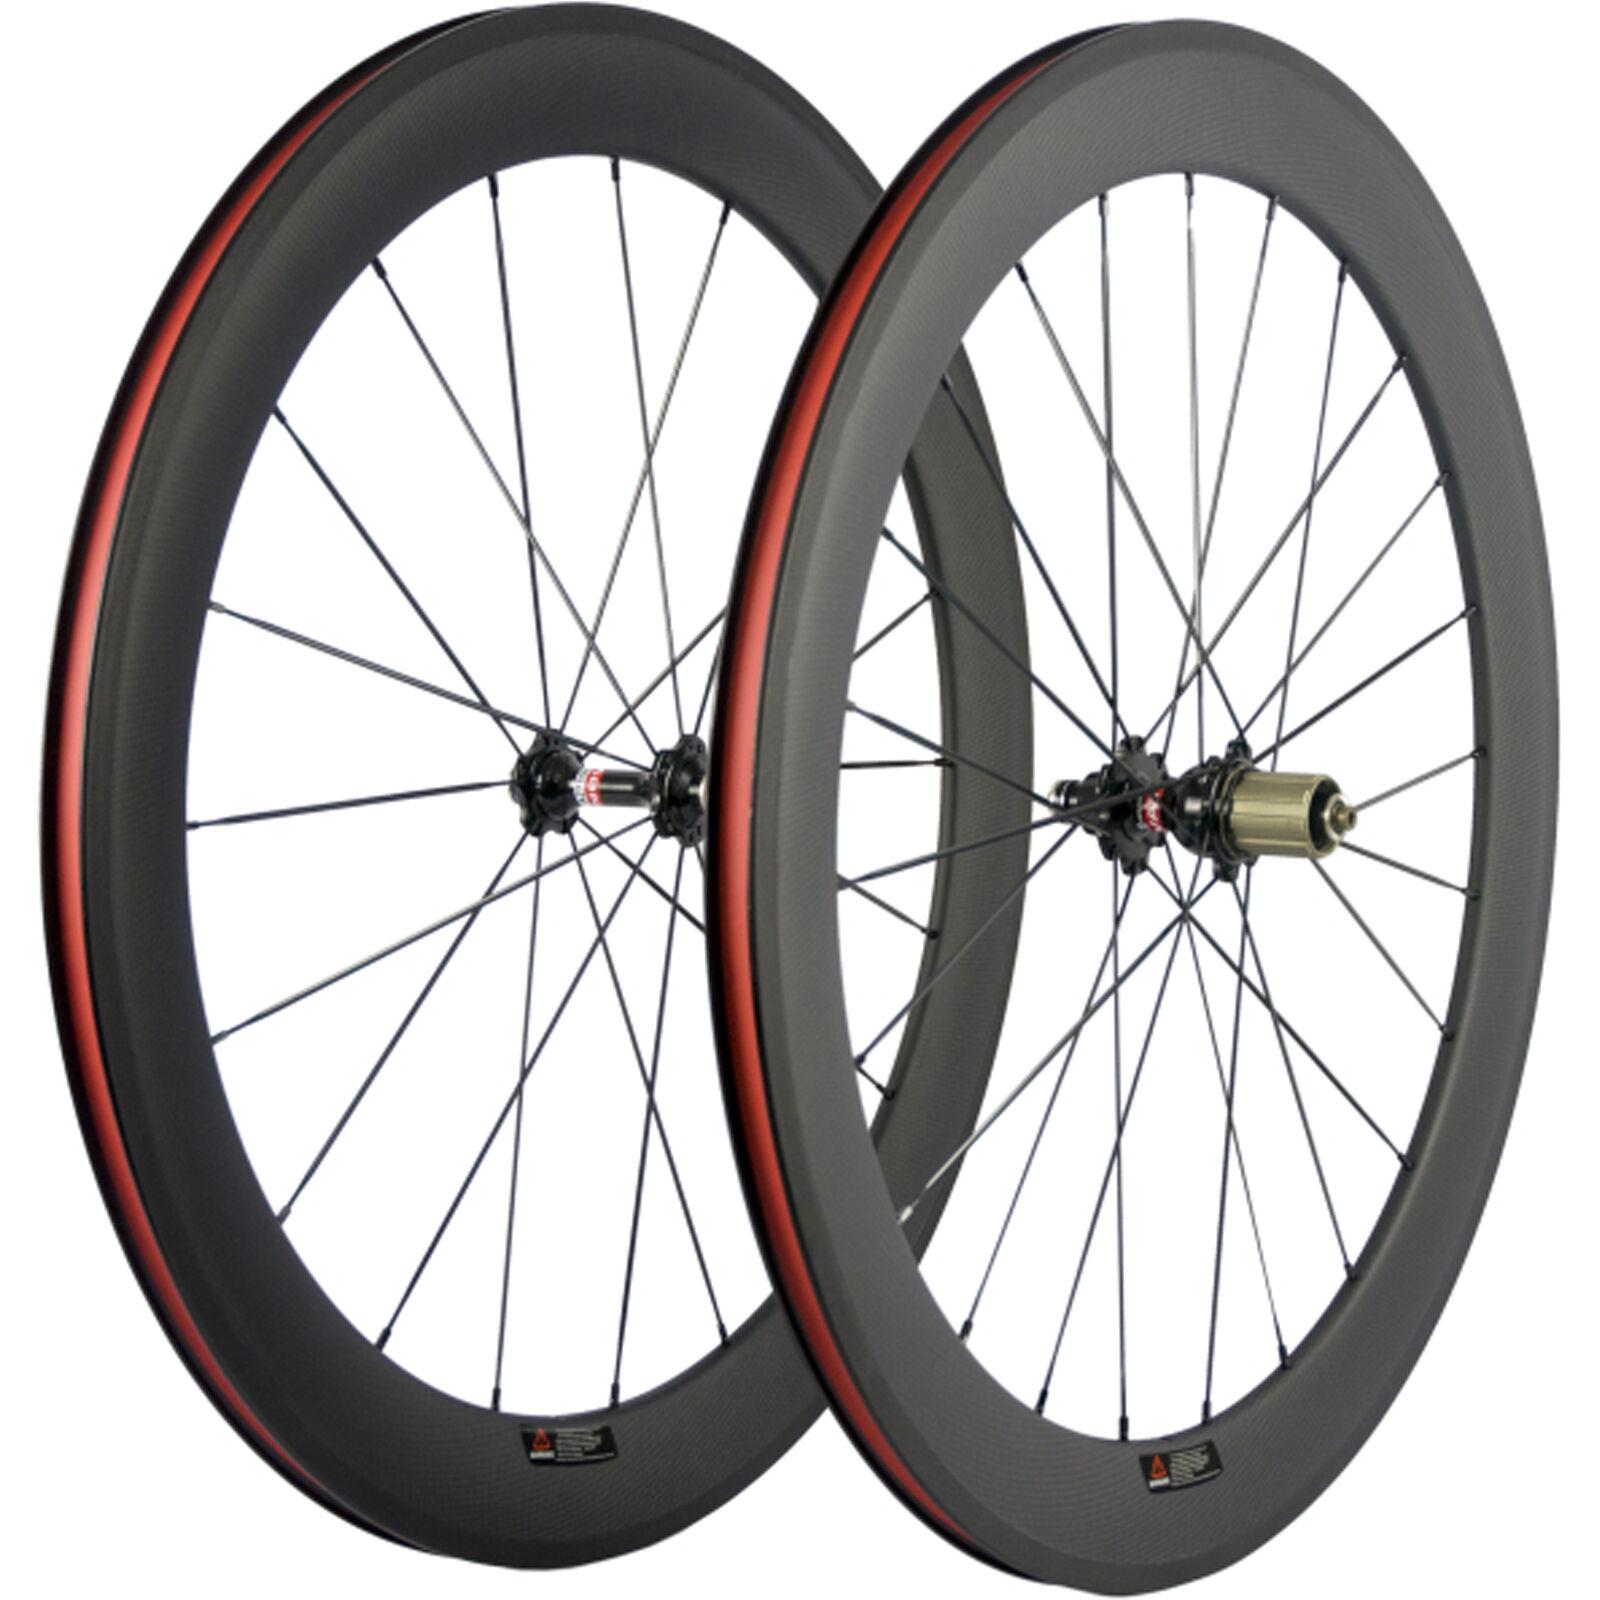 Basalt Brake Surface Clincher Carbon Wheels 60mm Road Bicycle Carbon Wheelset